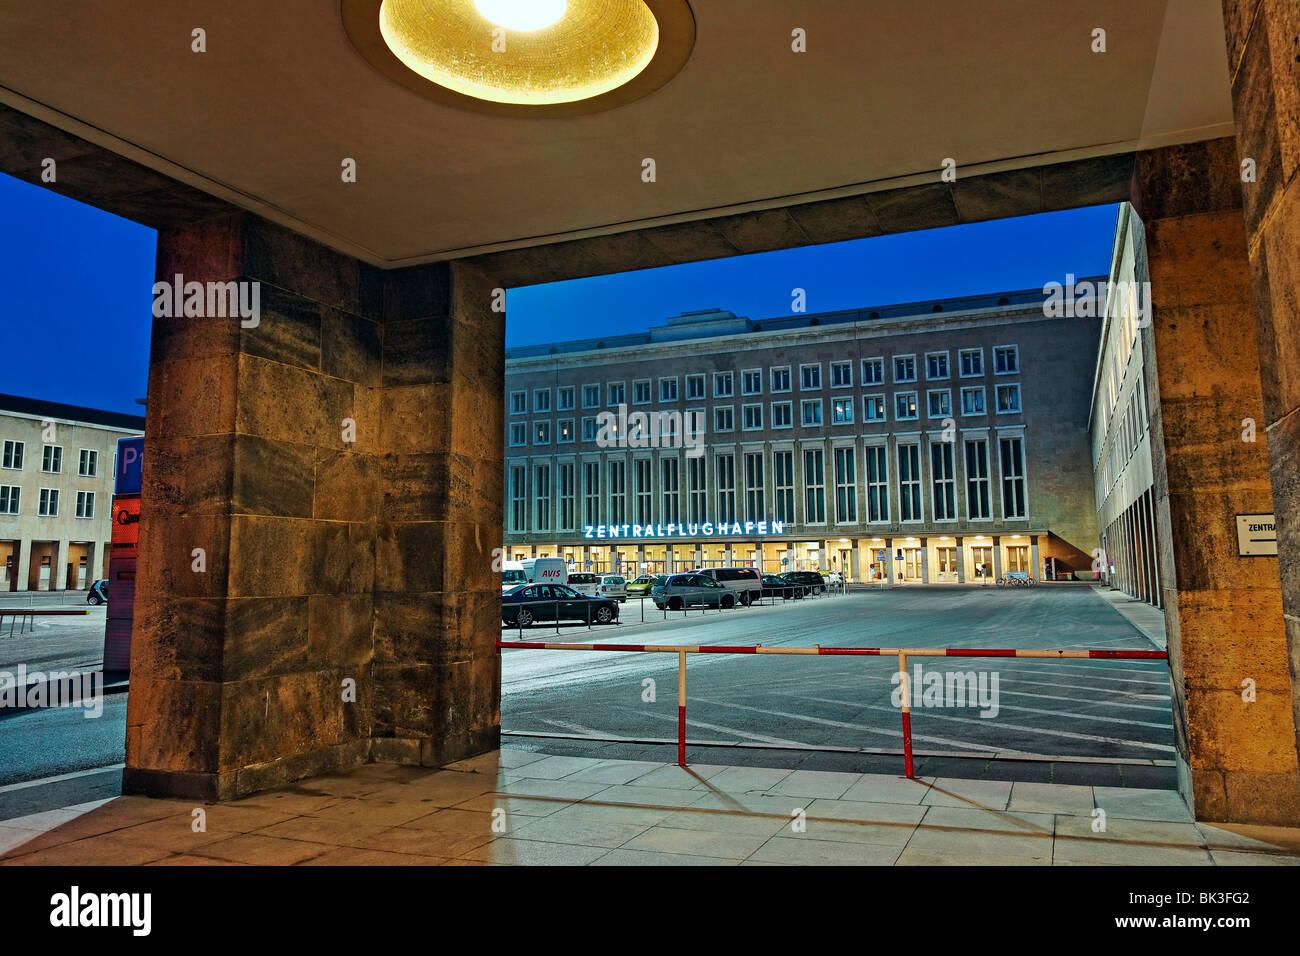 Tempelhof Airport, Berlin, Germany, Europe - Stock Image